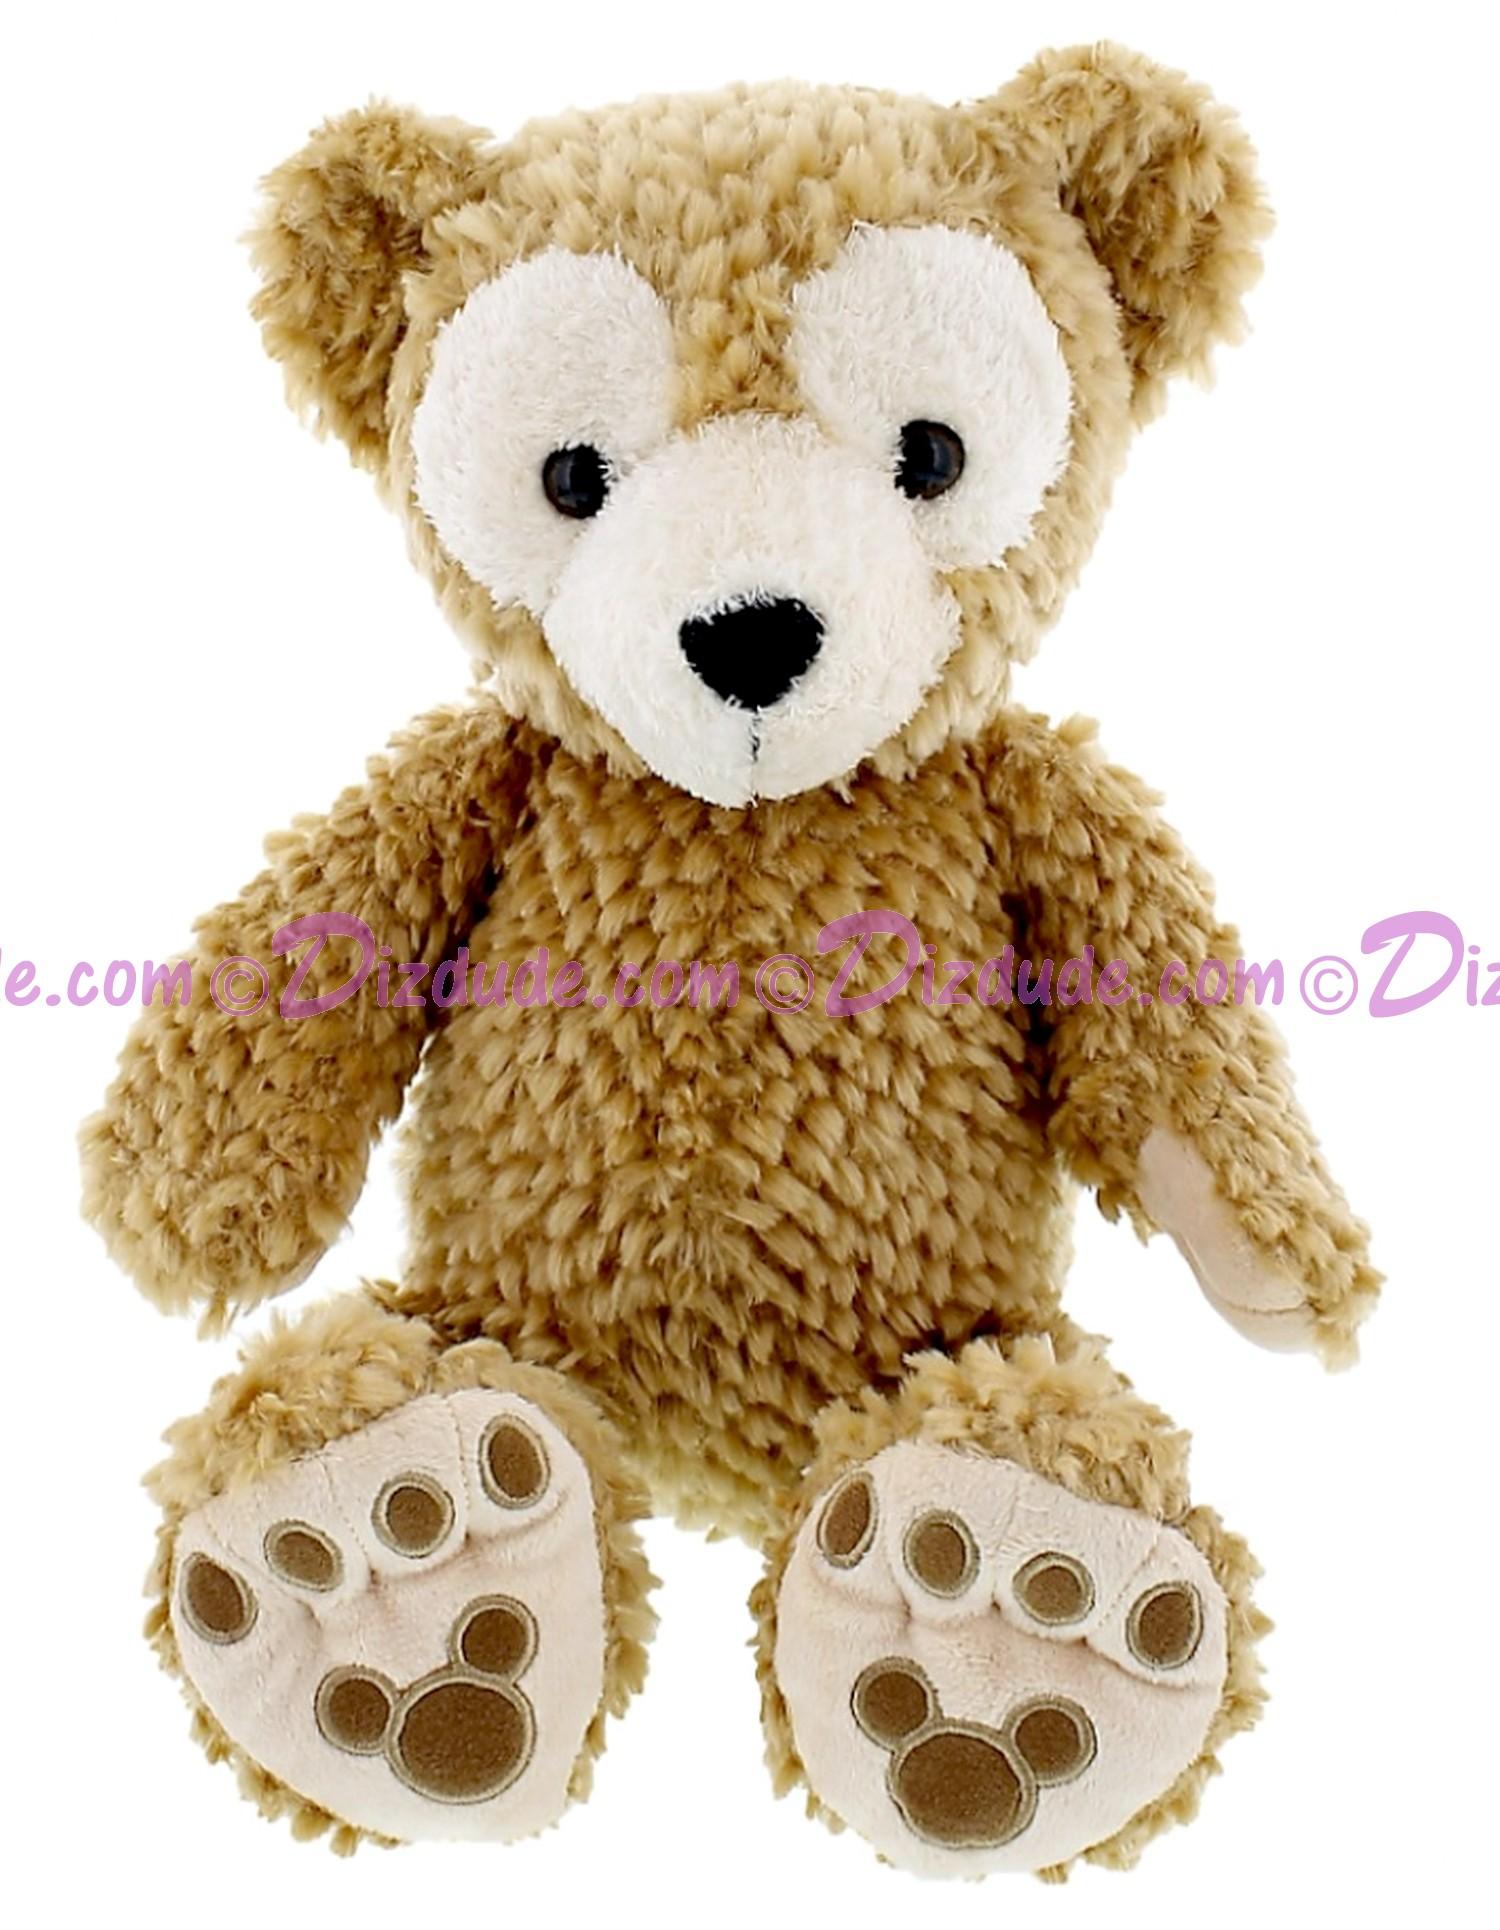 "Duffy The Disney Bear 17"" Plush Toy © Dizdude.com"